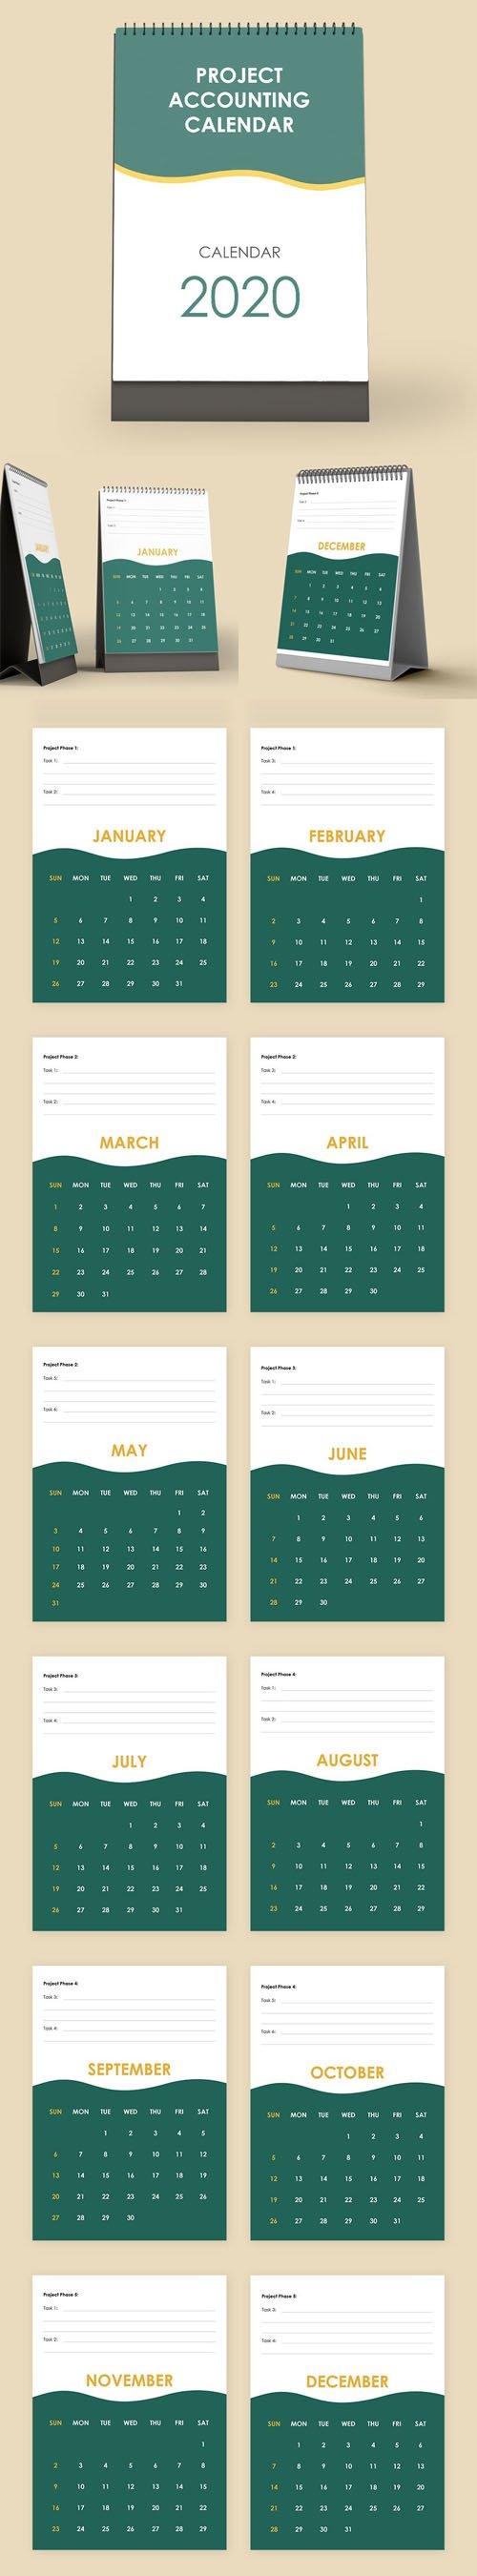 Project Accounting Desk Calendar (Word/Google Docs) Templates